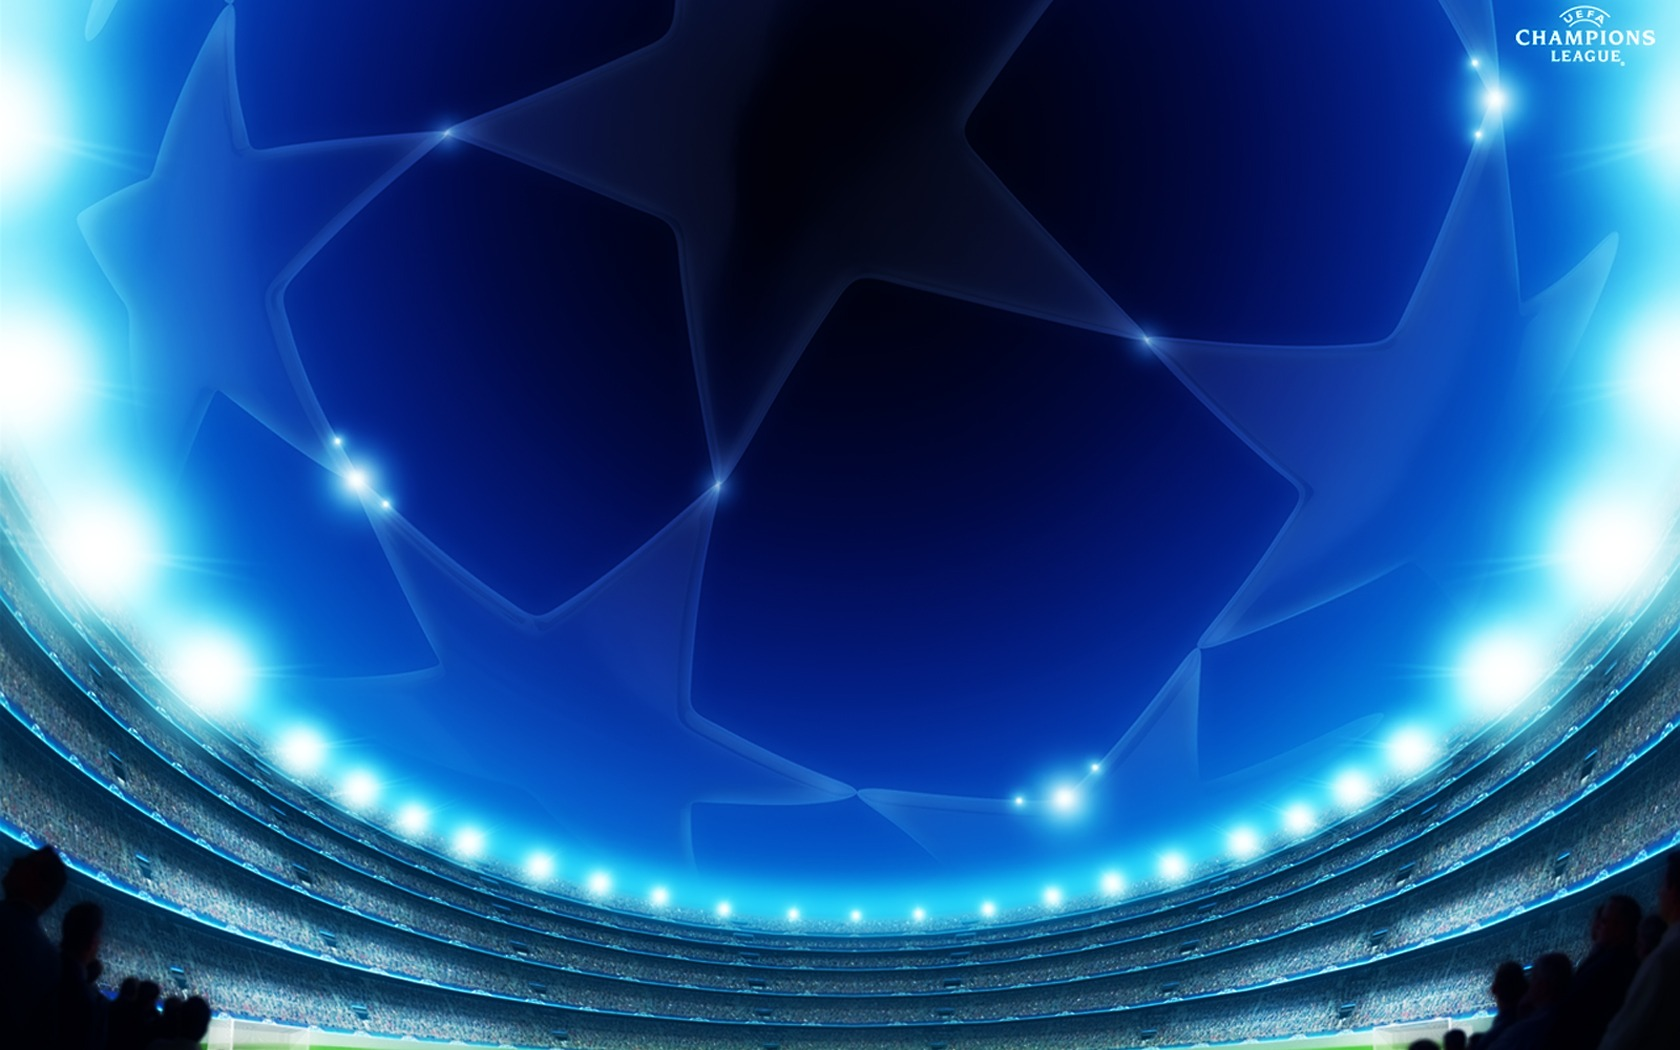 Football  Sports Wallpaper Champions Wallpapers UEFA League